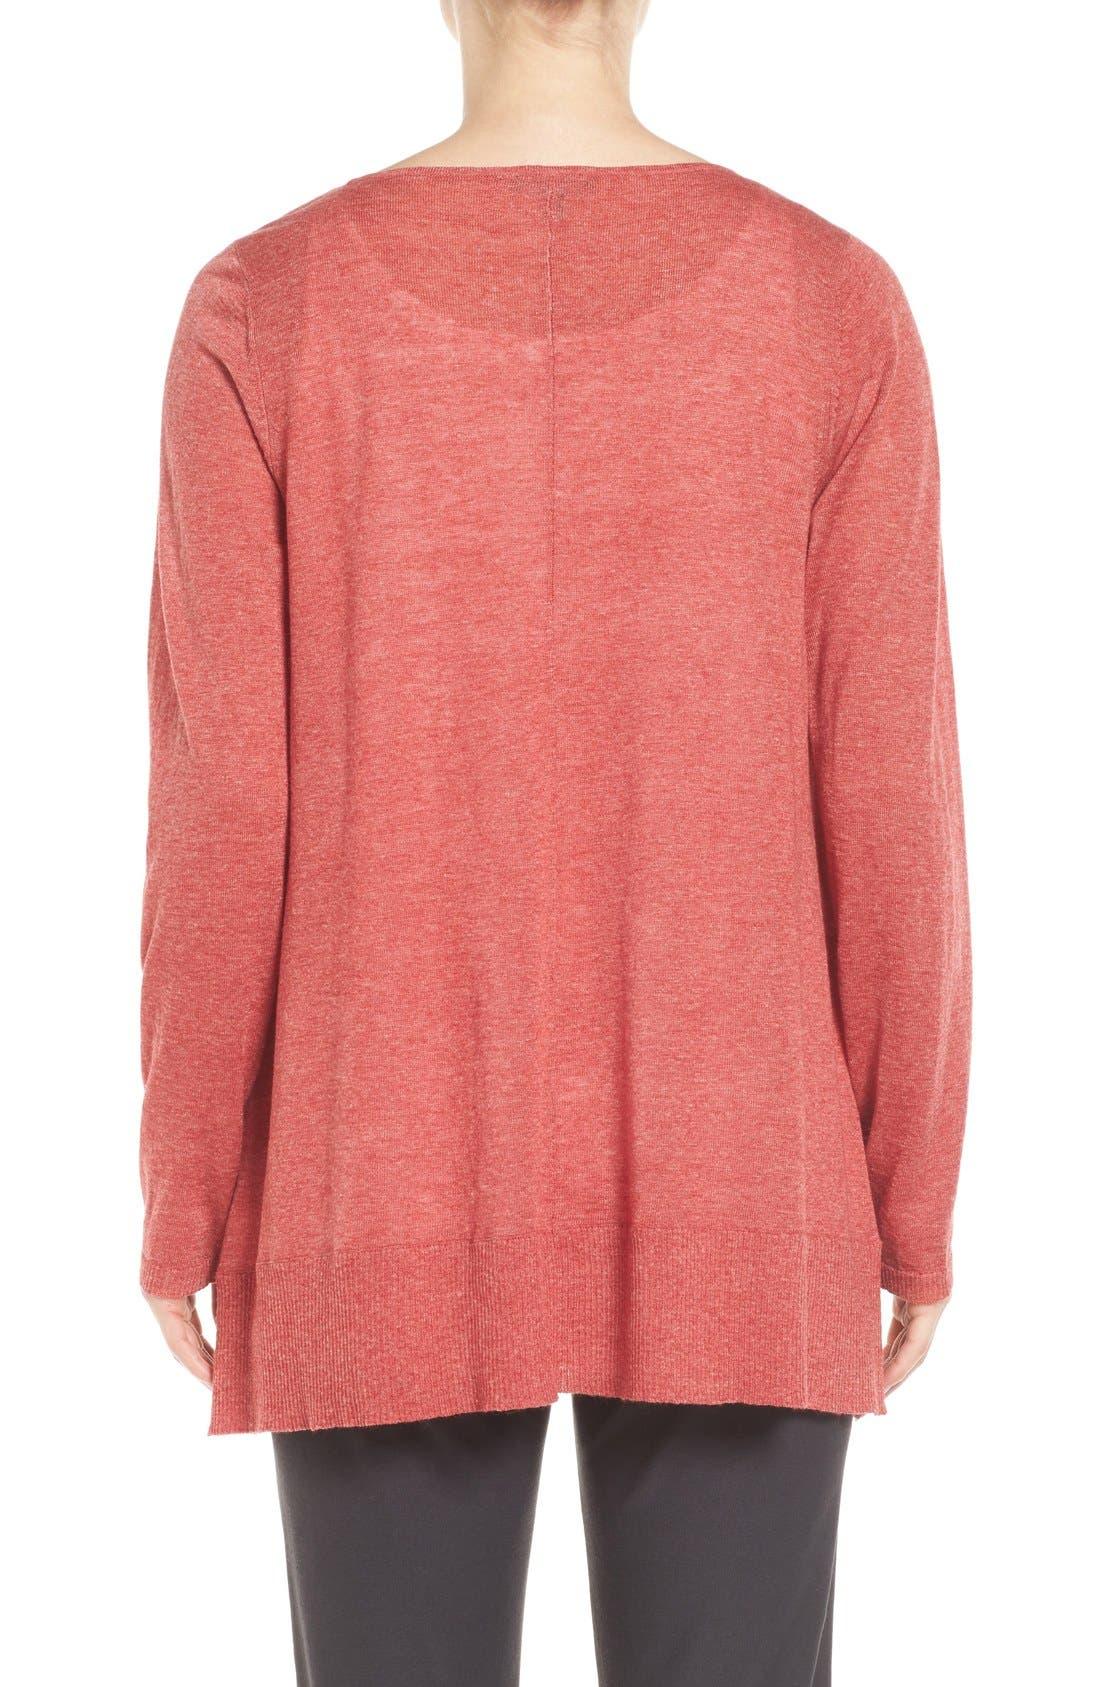 Alternate Image 2  - Eileen Fisher Scoop Neck Sweater (Regular & Petite)